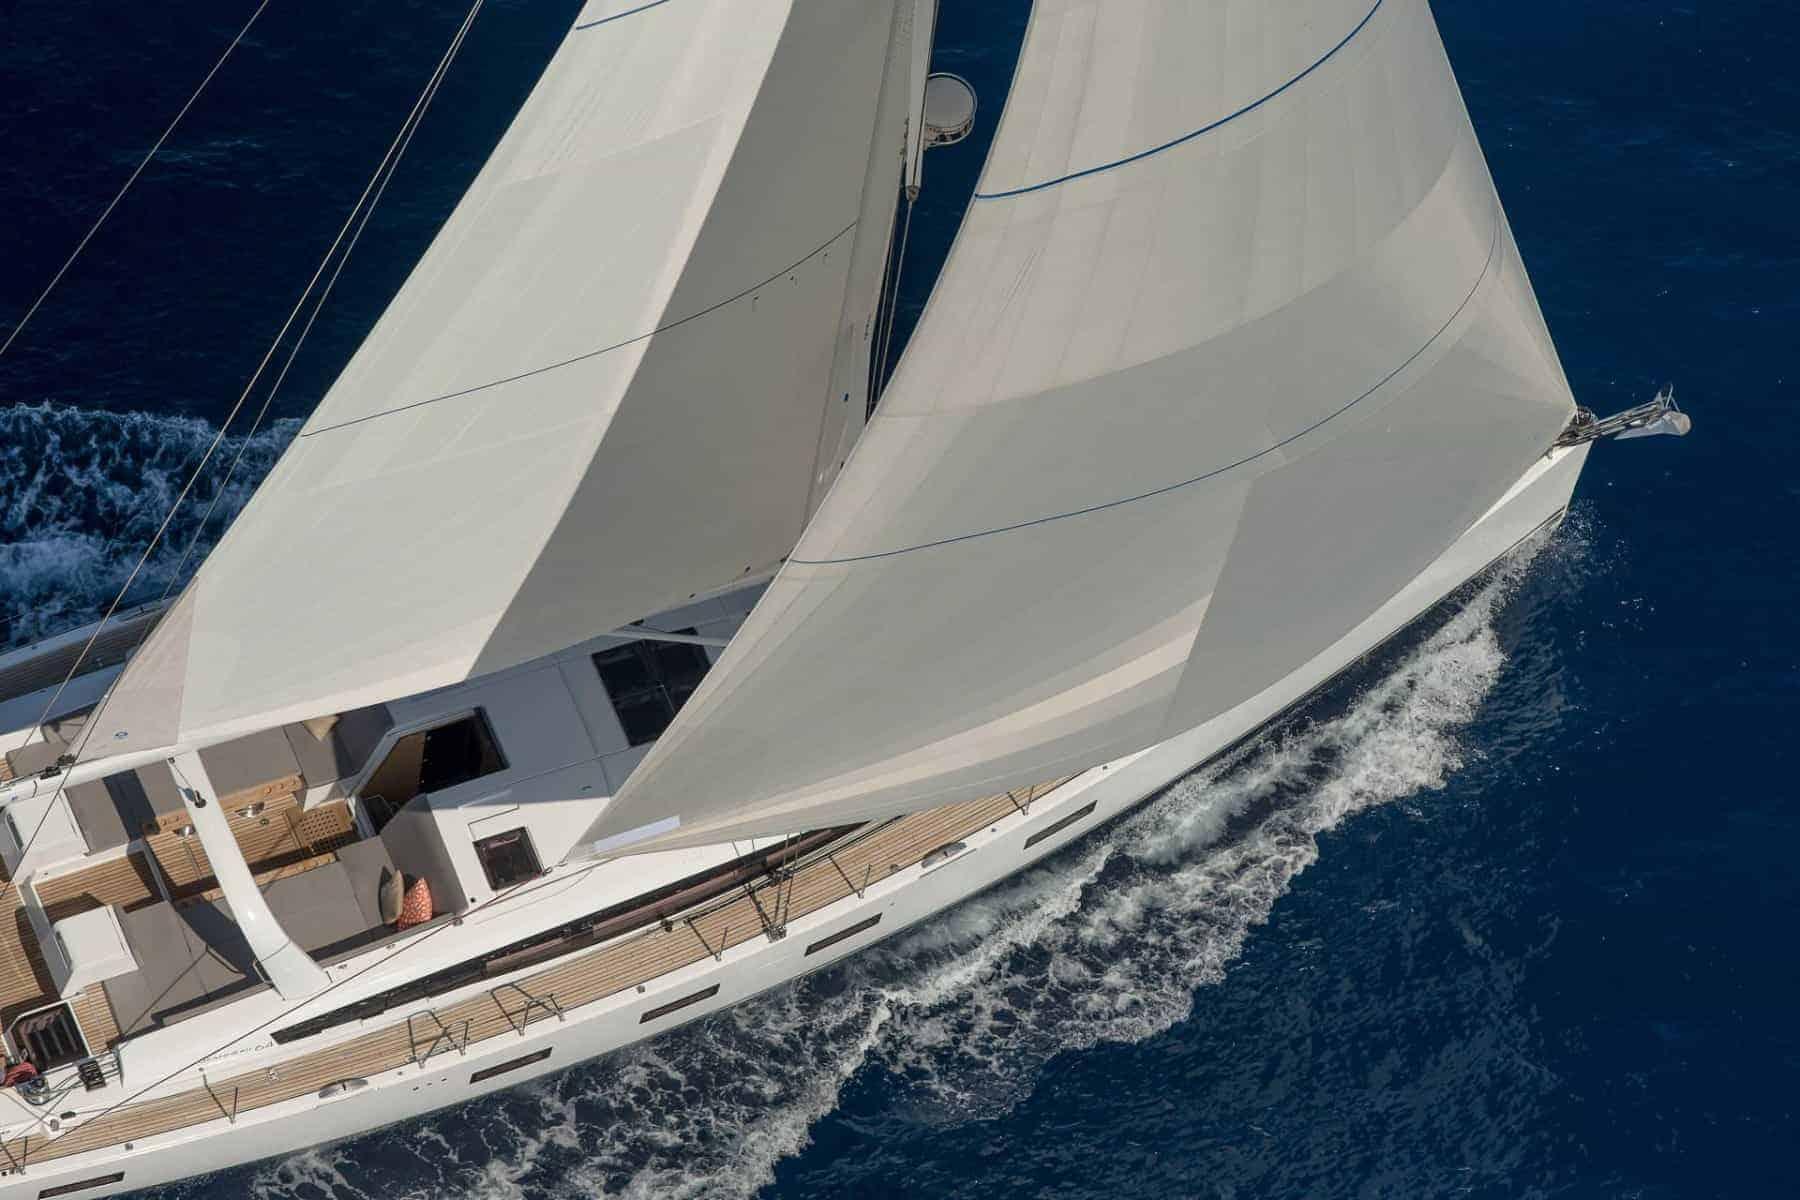 Jeanneau-64-exterior-16-charter-ownership-yacht